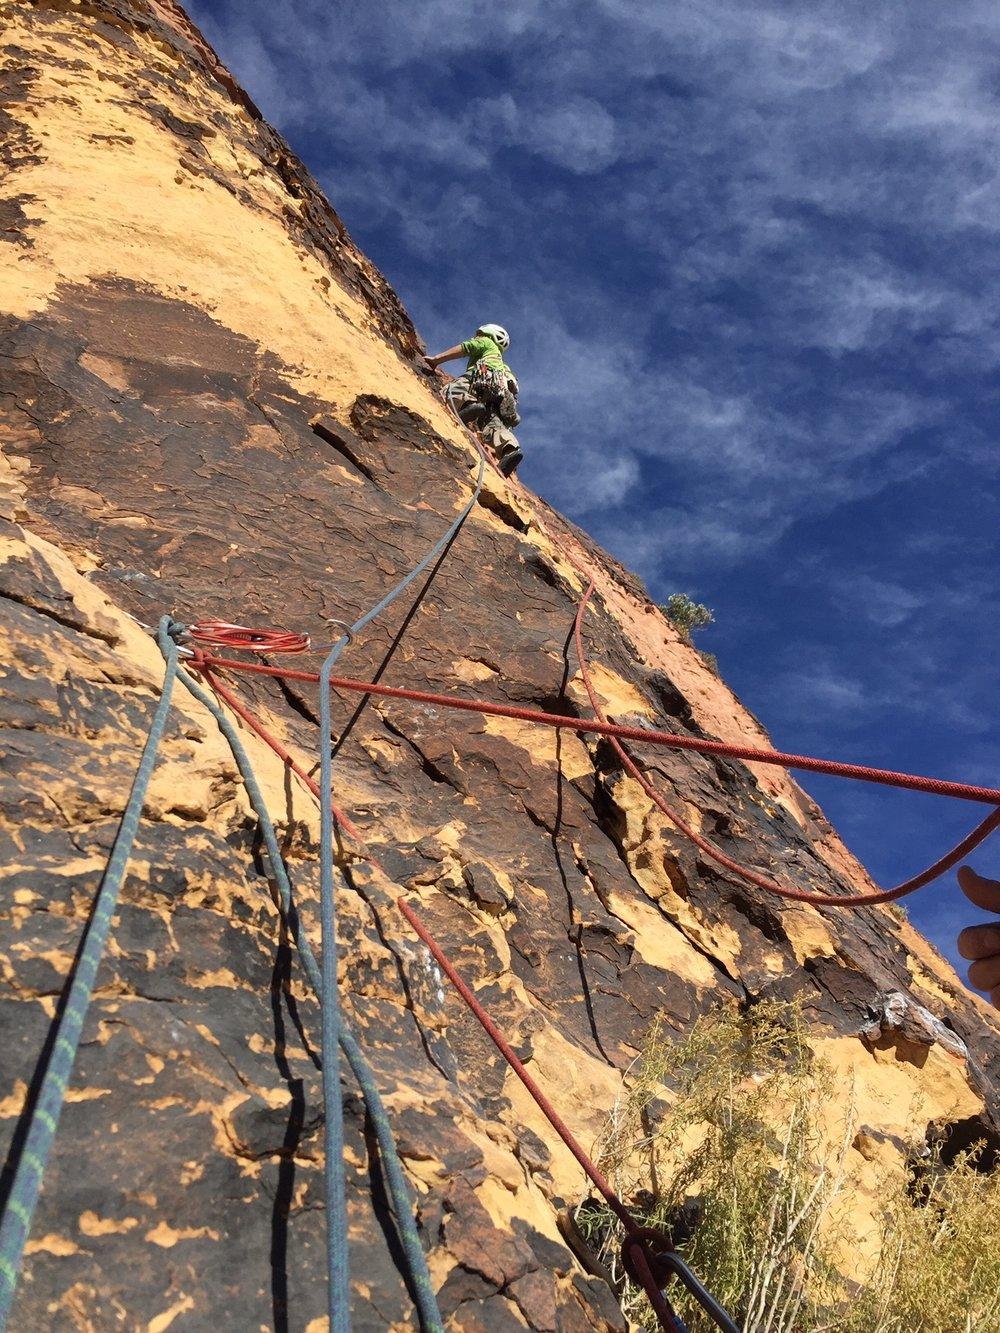 3 Person Rope Team 4 Red Rock Nevada 2 Alpine Climber Rock Climbing SAANO Adventures Trad Climbing Multi Pitch.JPG